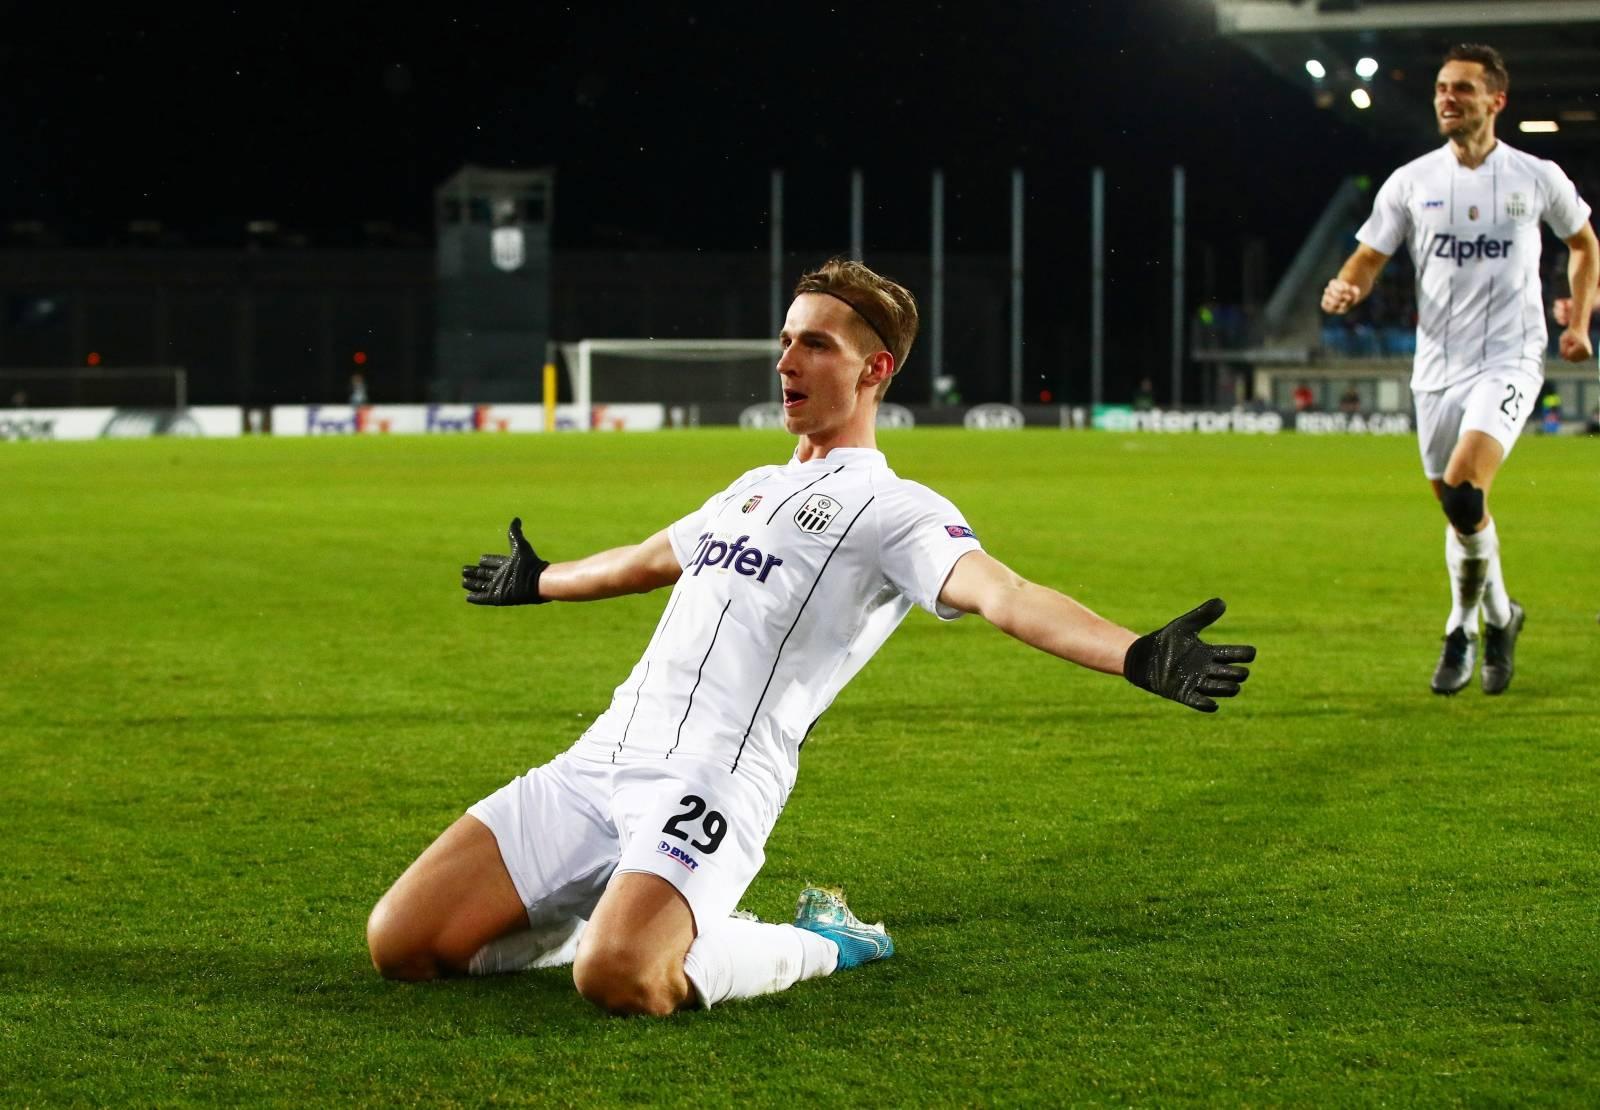 Europa League - Round of 32 Second Leg - LASK Linz v AZ Alkmaar